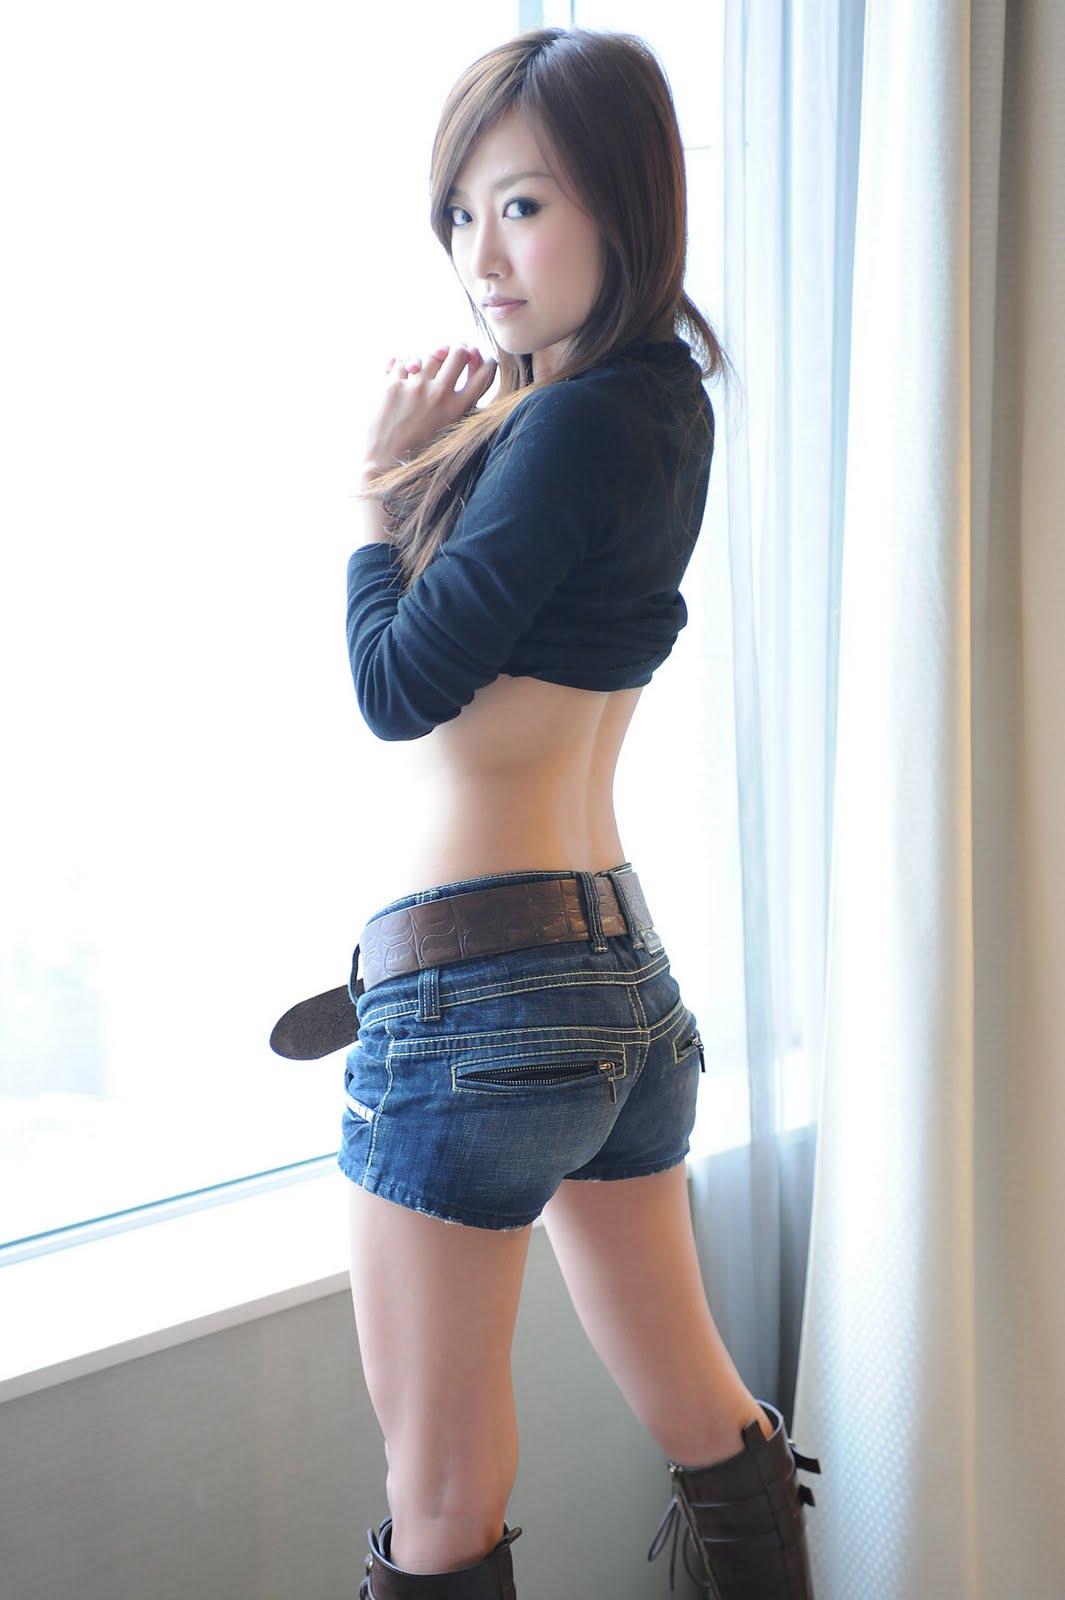 Bikini With Shorts For Girls